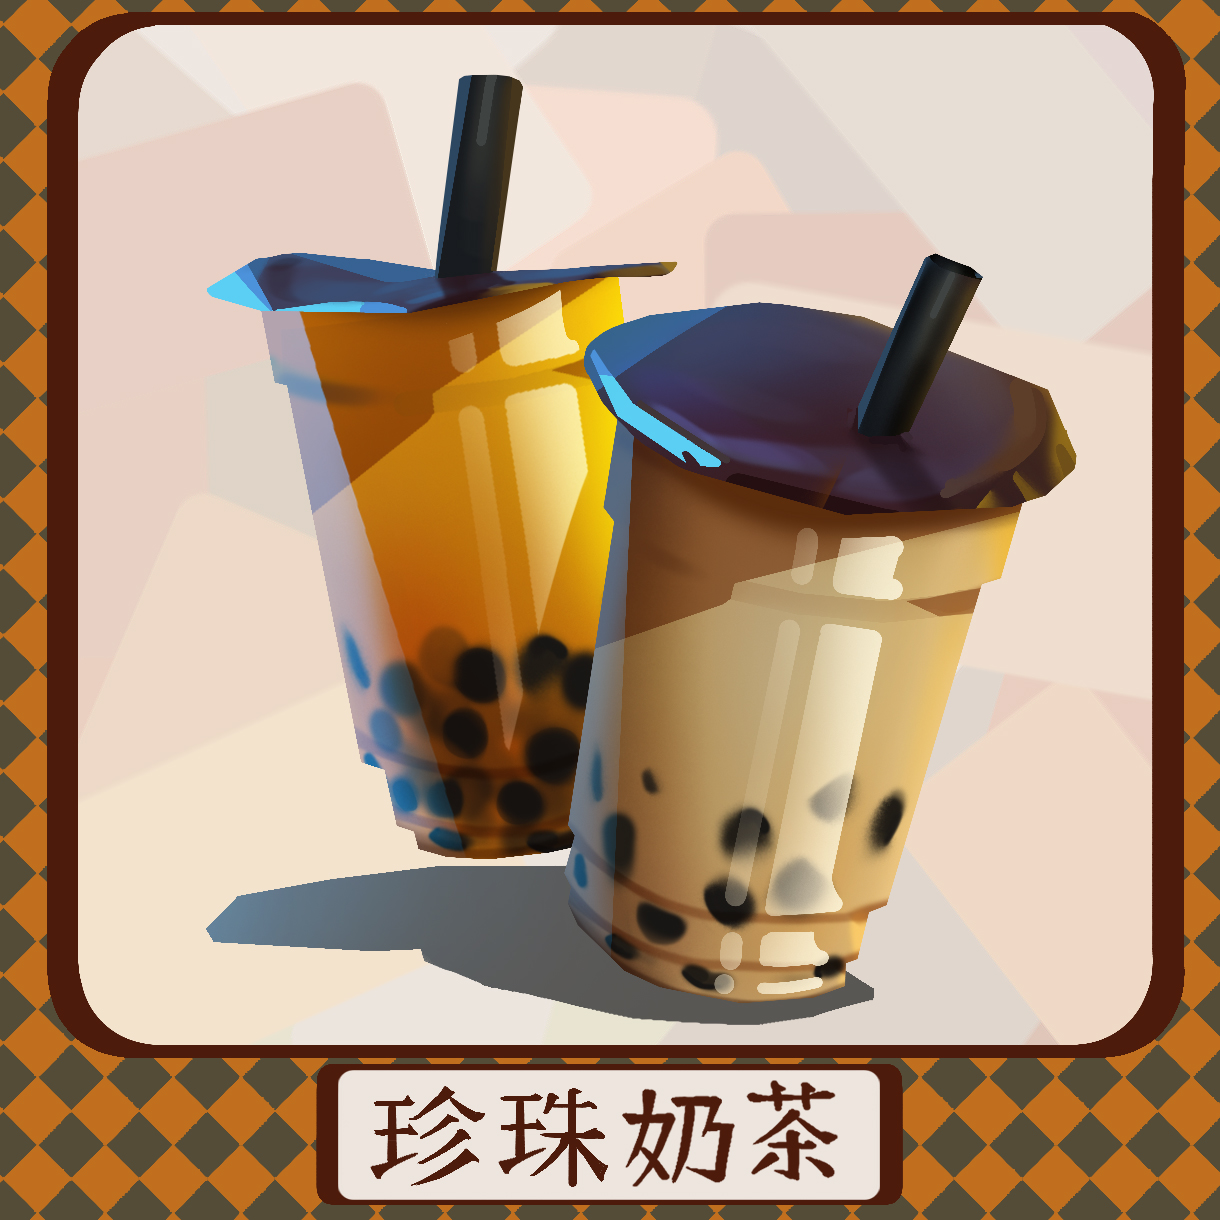 Taiwanese Foods: Pearl Milk Tea